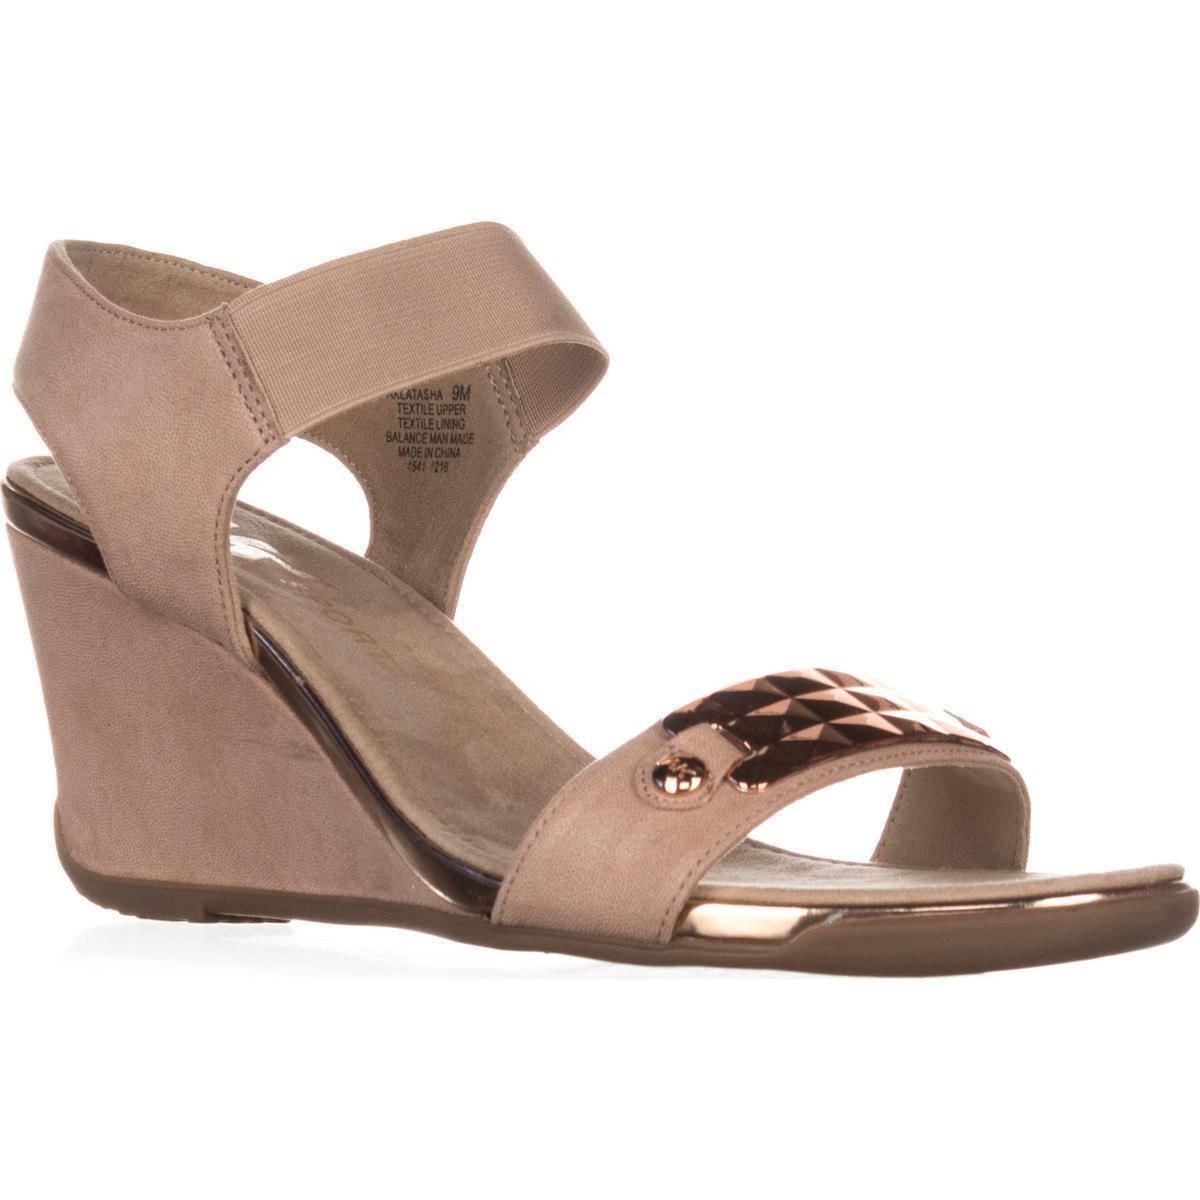 a631d0635ff2 Anne Klein. Women s Ak Sport Latasha Comfort Wedge Sandals ...